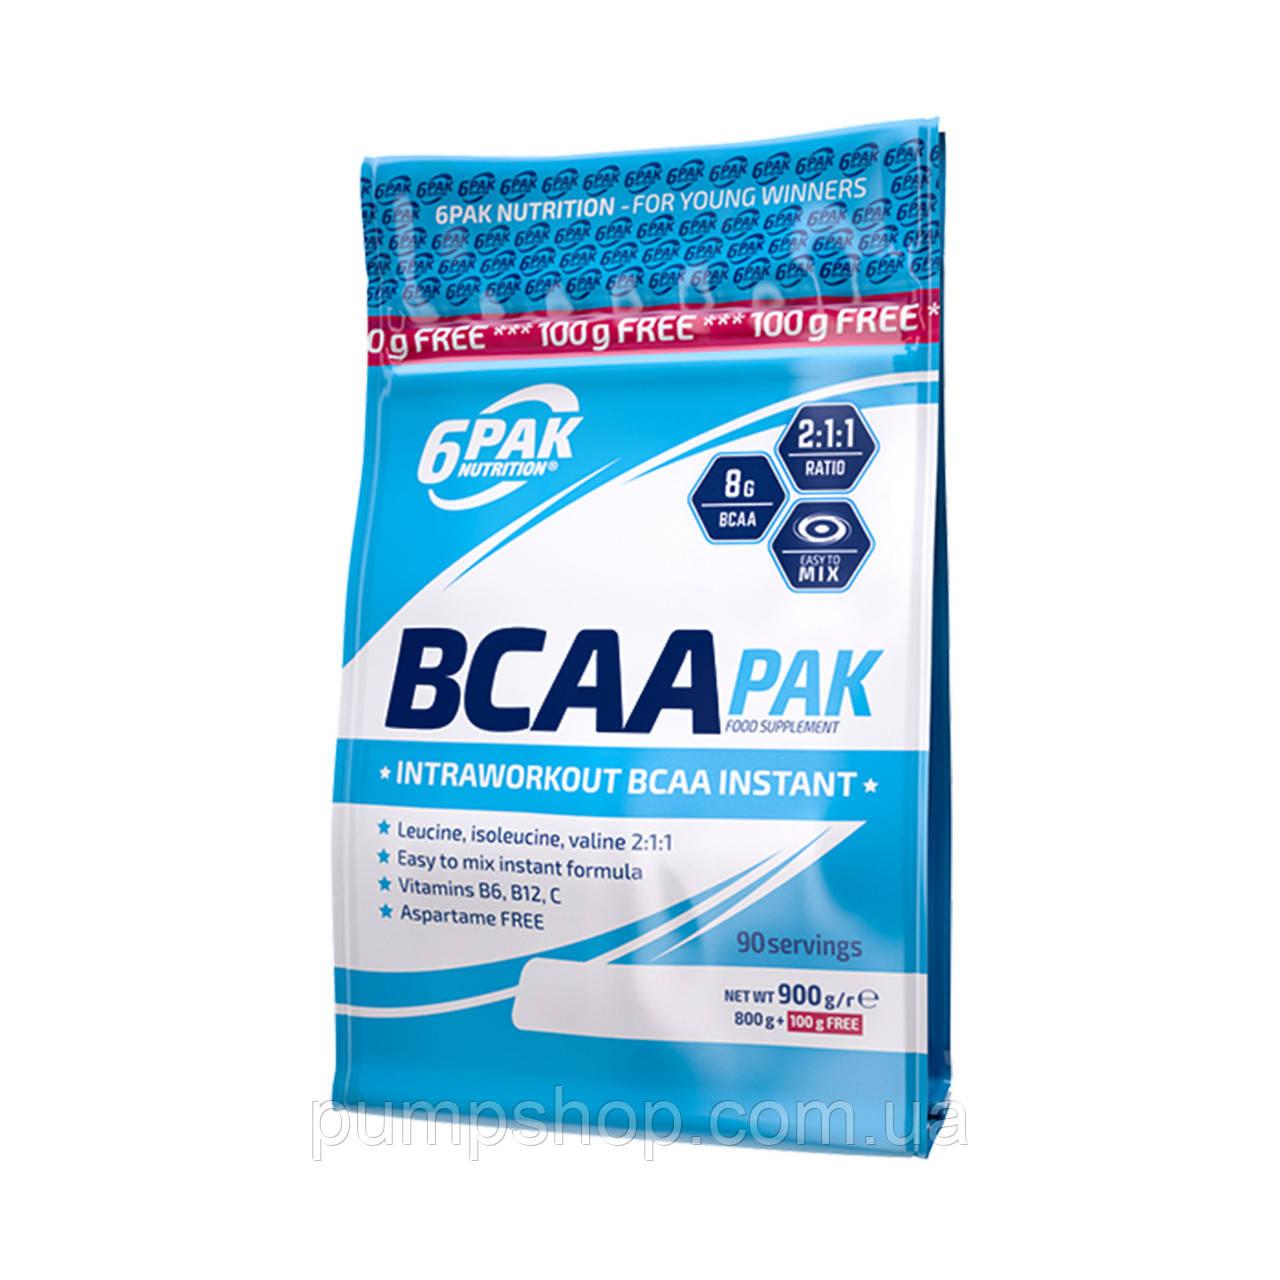 Аминокислоты бца 6PAK Nutrition BCAA PAK 2:1:1 Instant 900 г